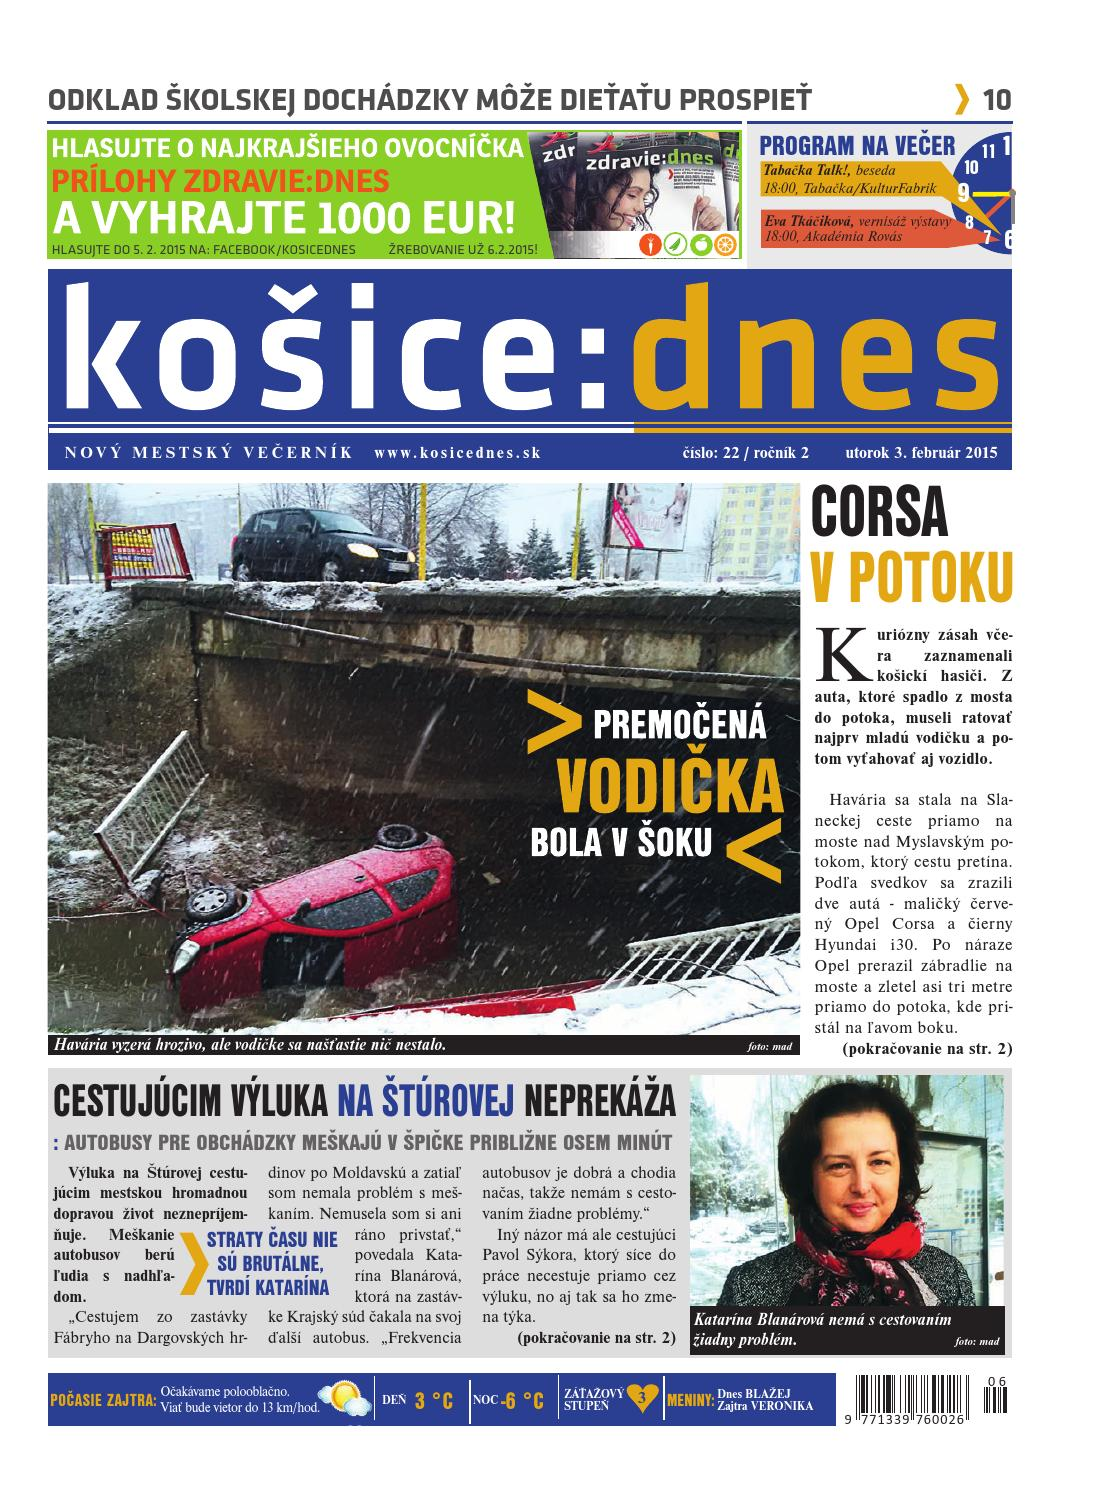 kosice dnes by KOŠICE DNES - issuu 9f3d6524785